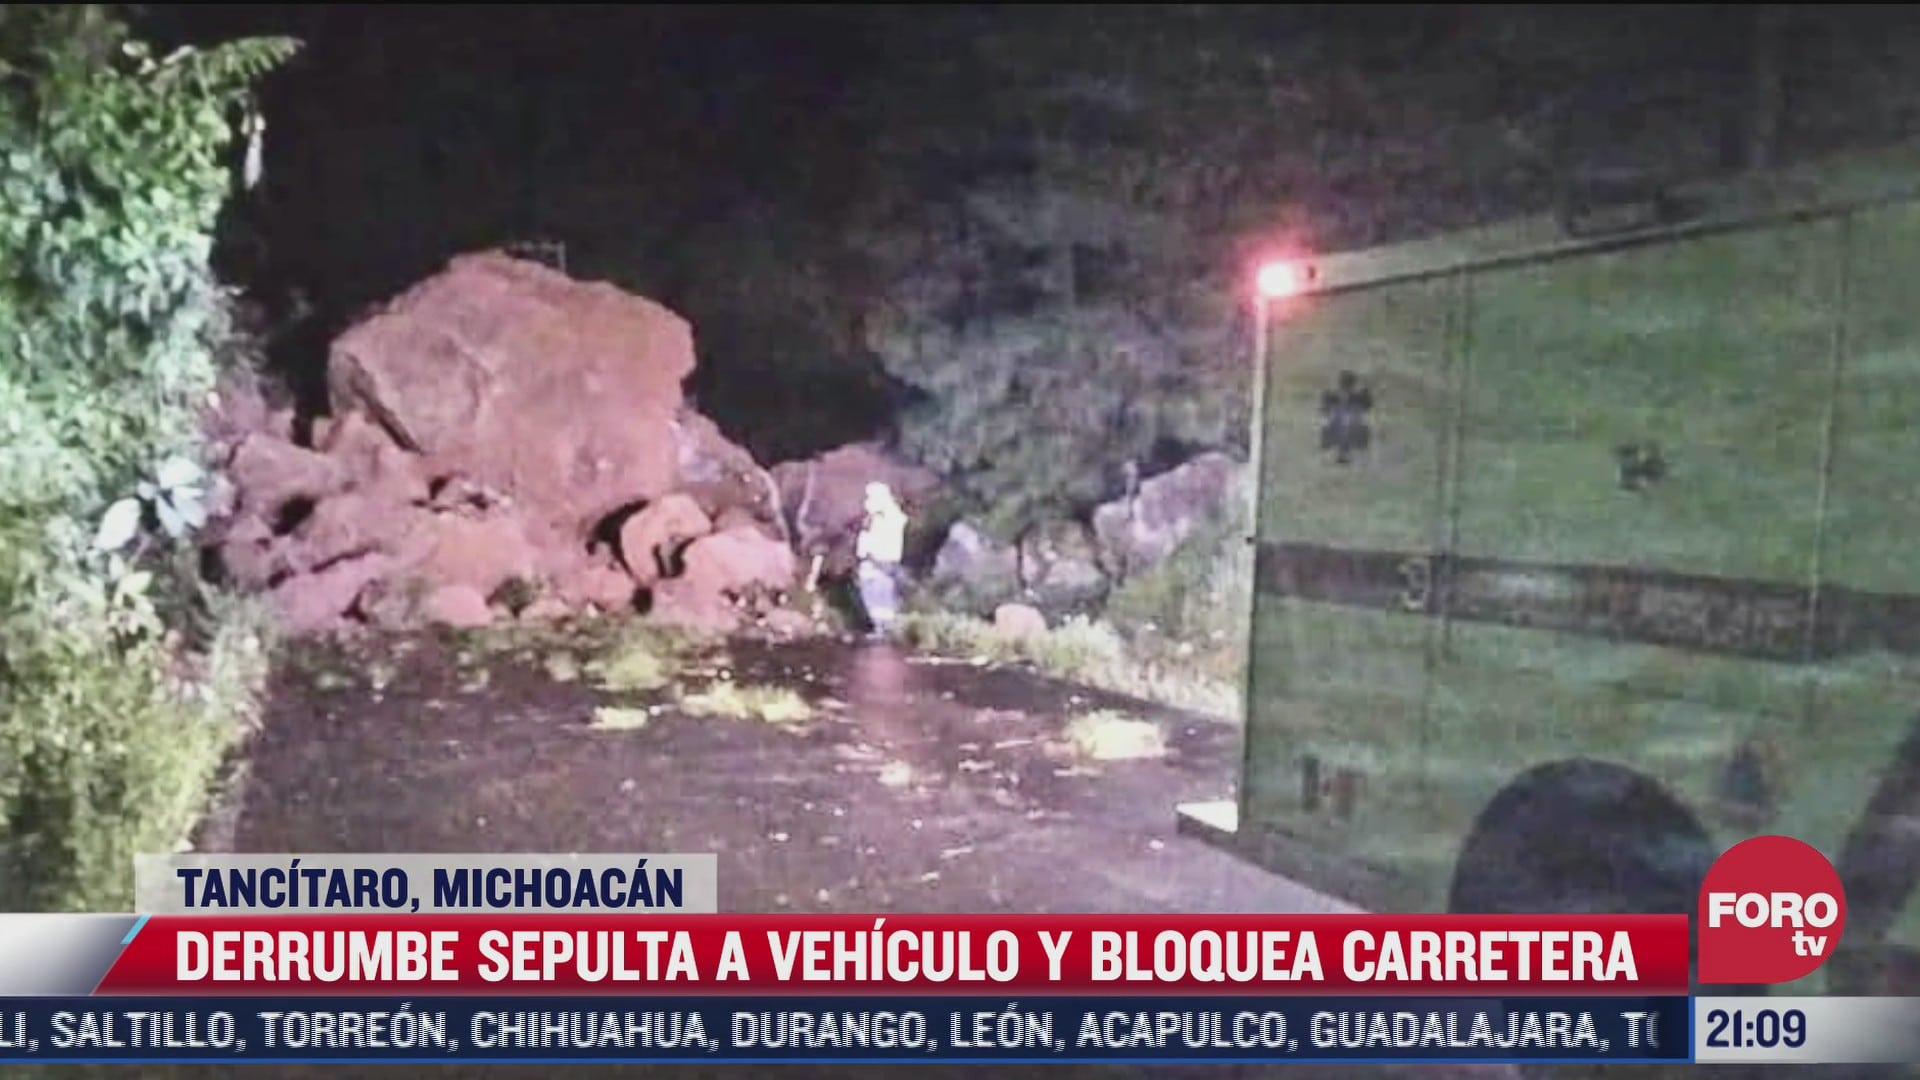 derrumbe bloquea carretera en tancitaro michoacan